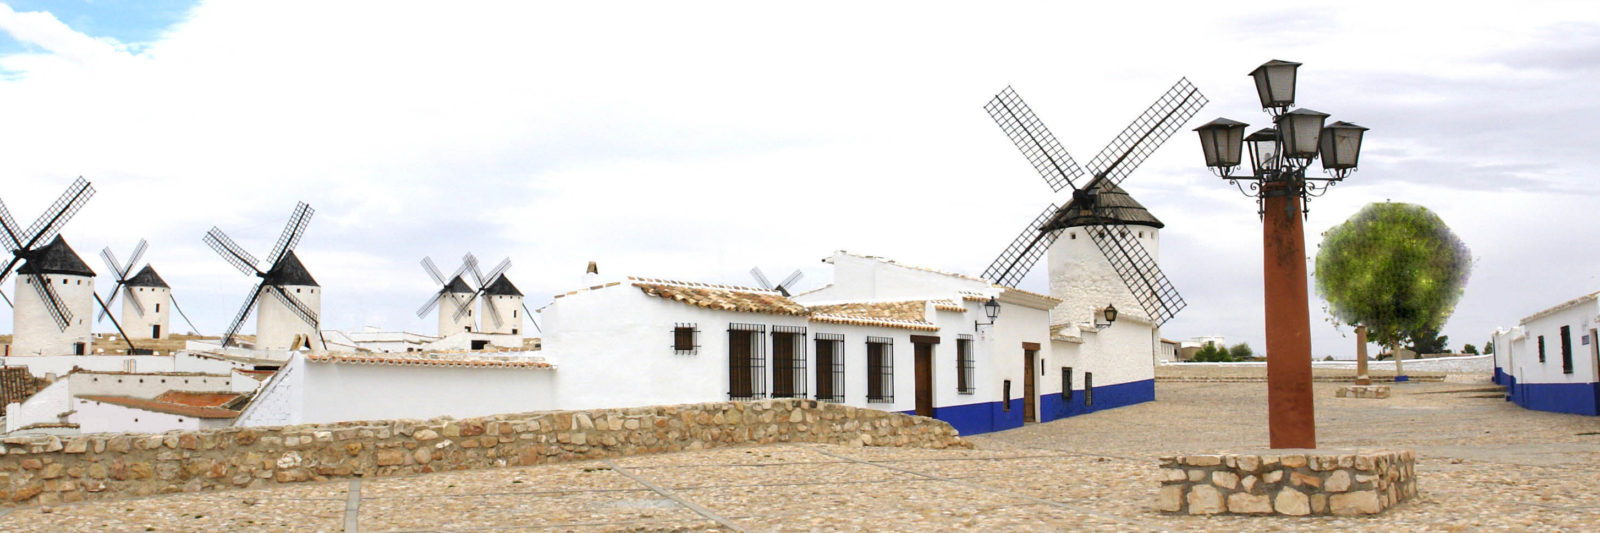 Cerro de la Paz, de Campo de Criptana